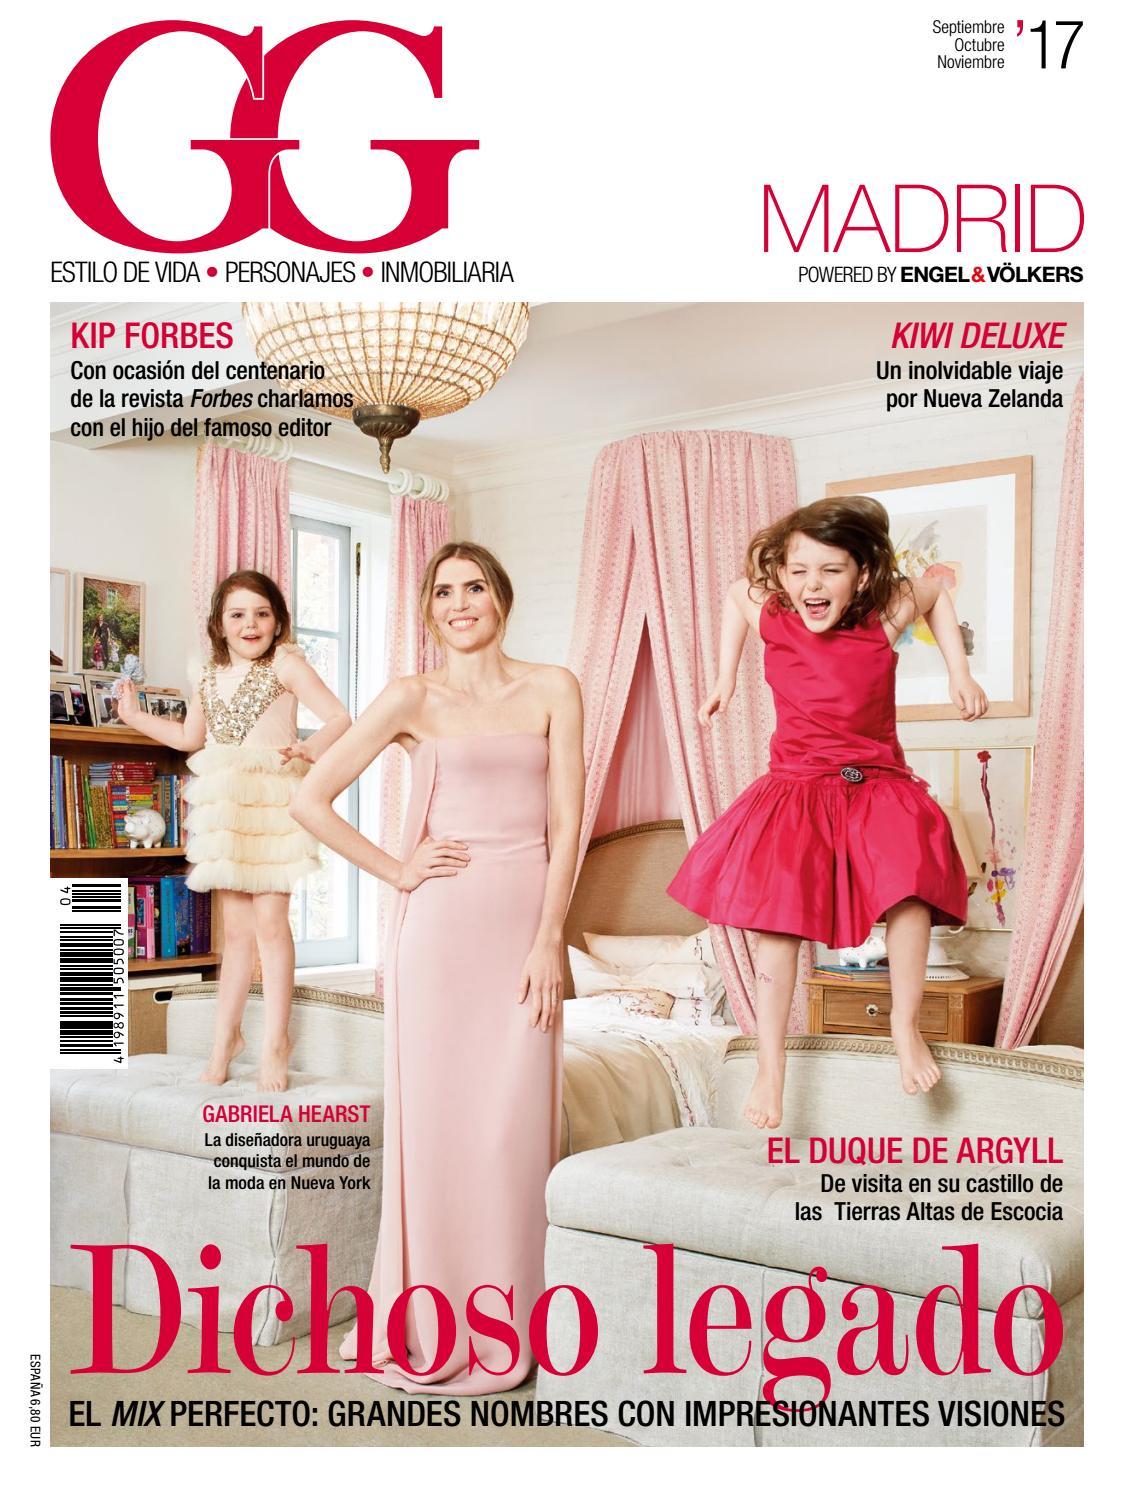 GG Magazine 04/17 Madrid by GG-Magazine - issuu